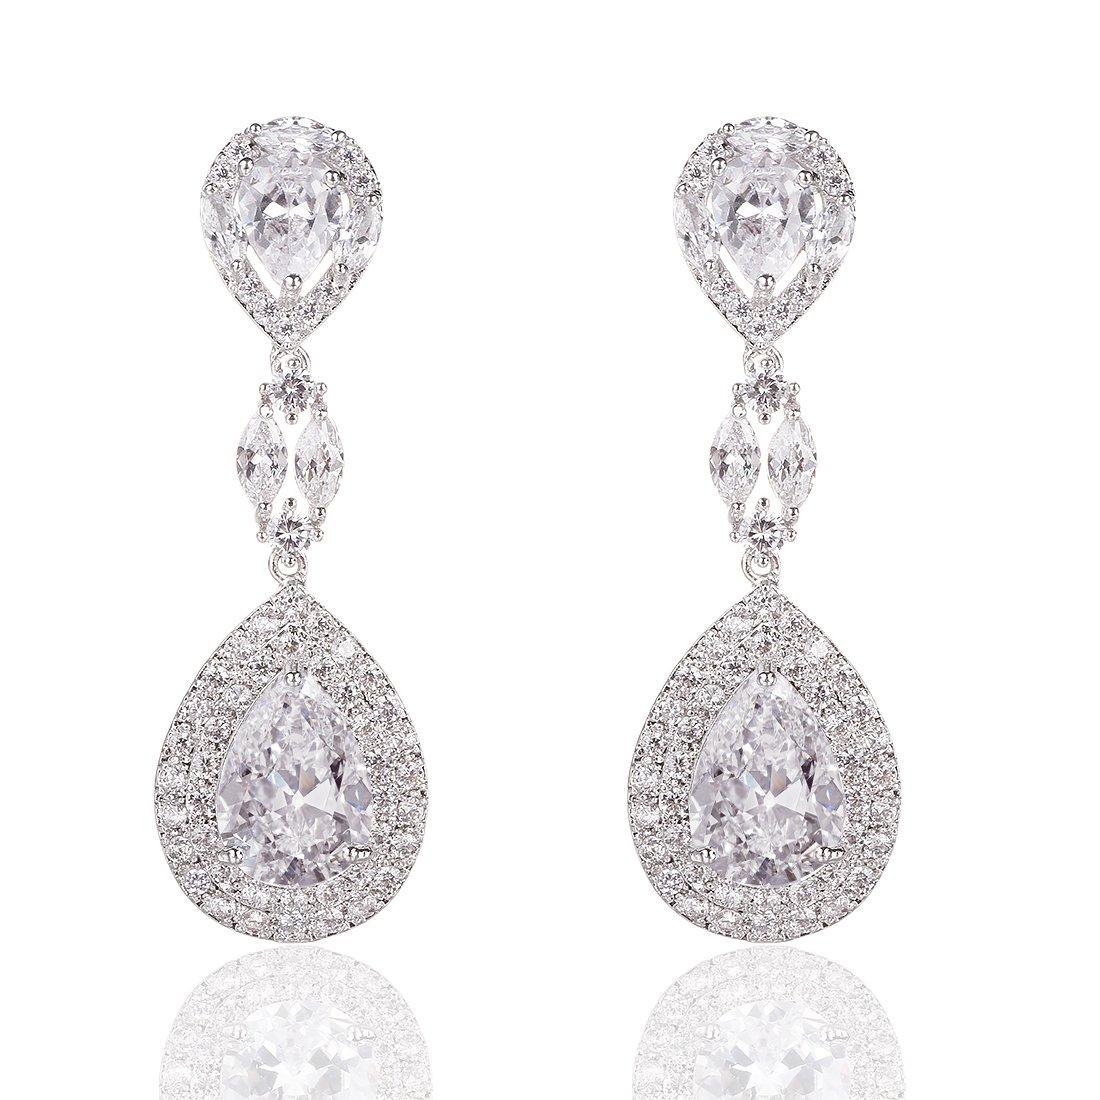 b44ae9926 Amazon.com: Wordless Love Genuine Rhodium Plated Cubic Zirconia Teardrop  Bride Wedding Dangle Pierced Earrings Clear: Jewelry